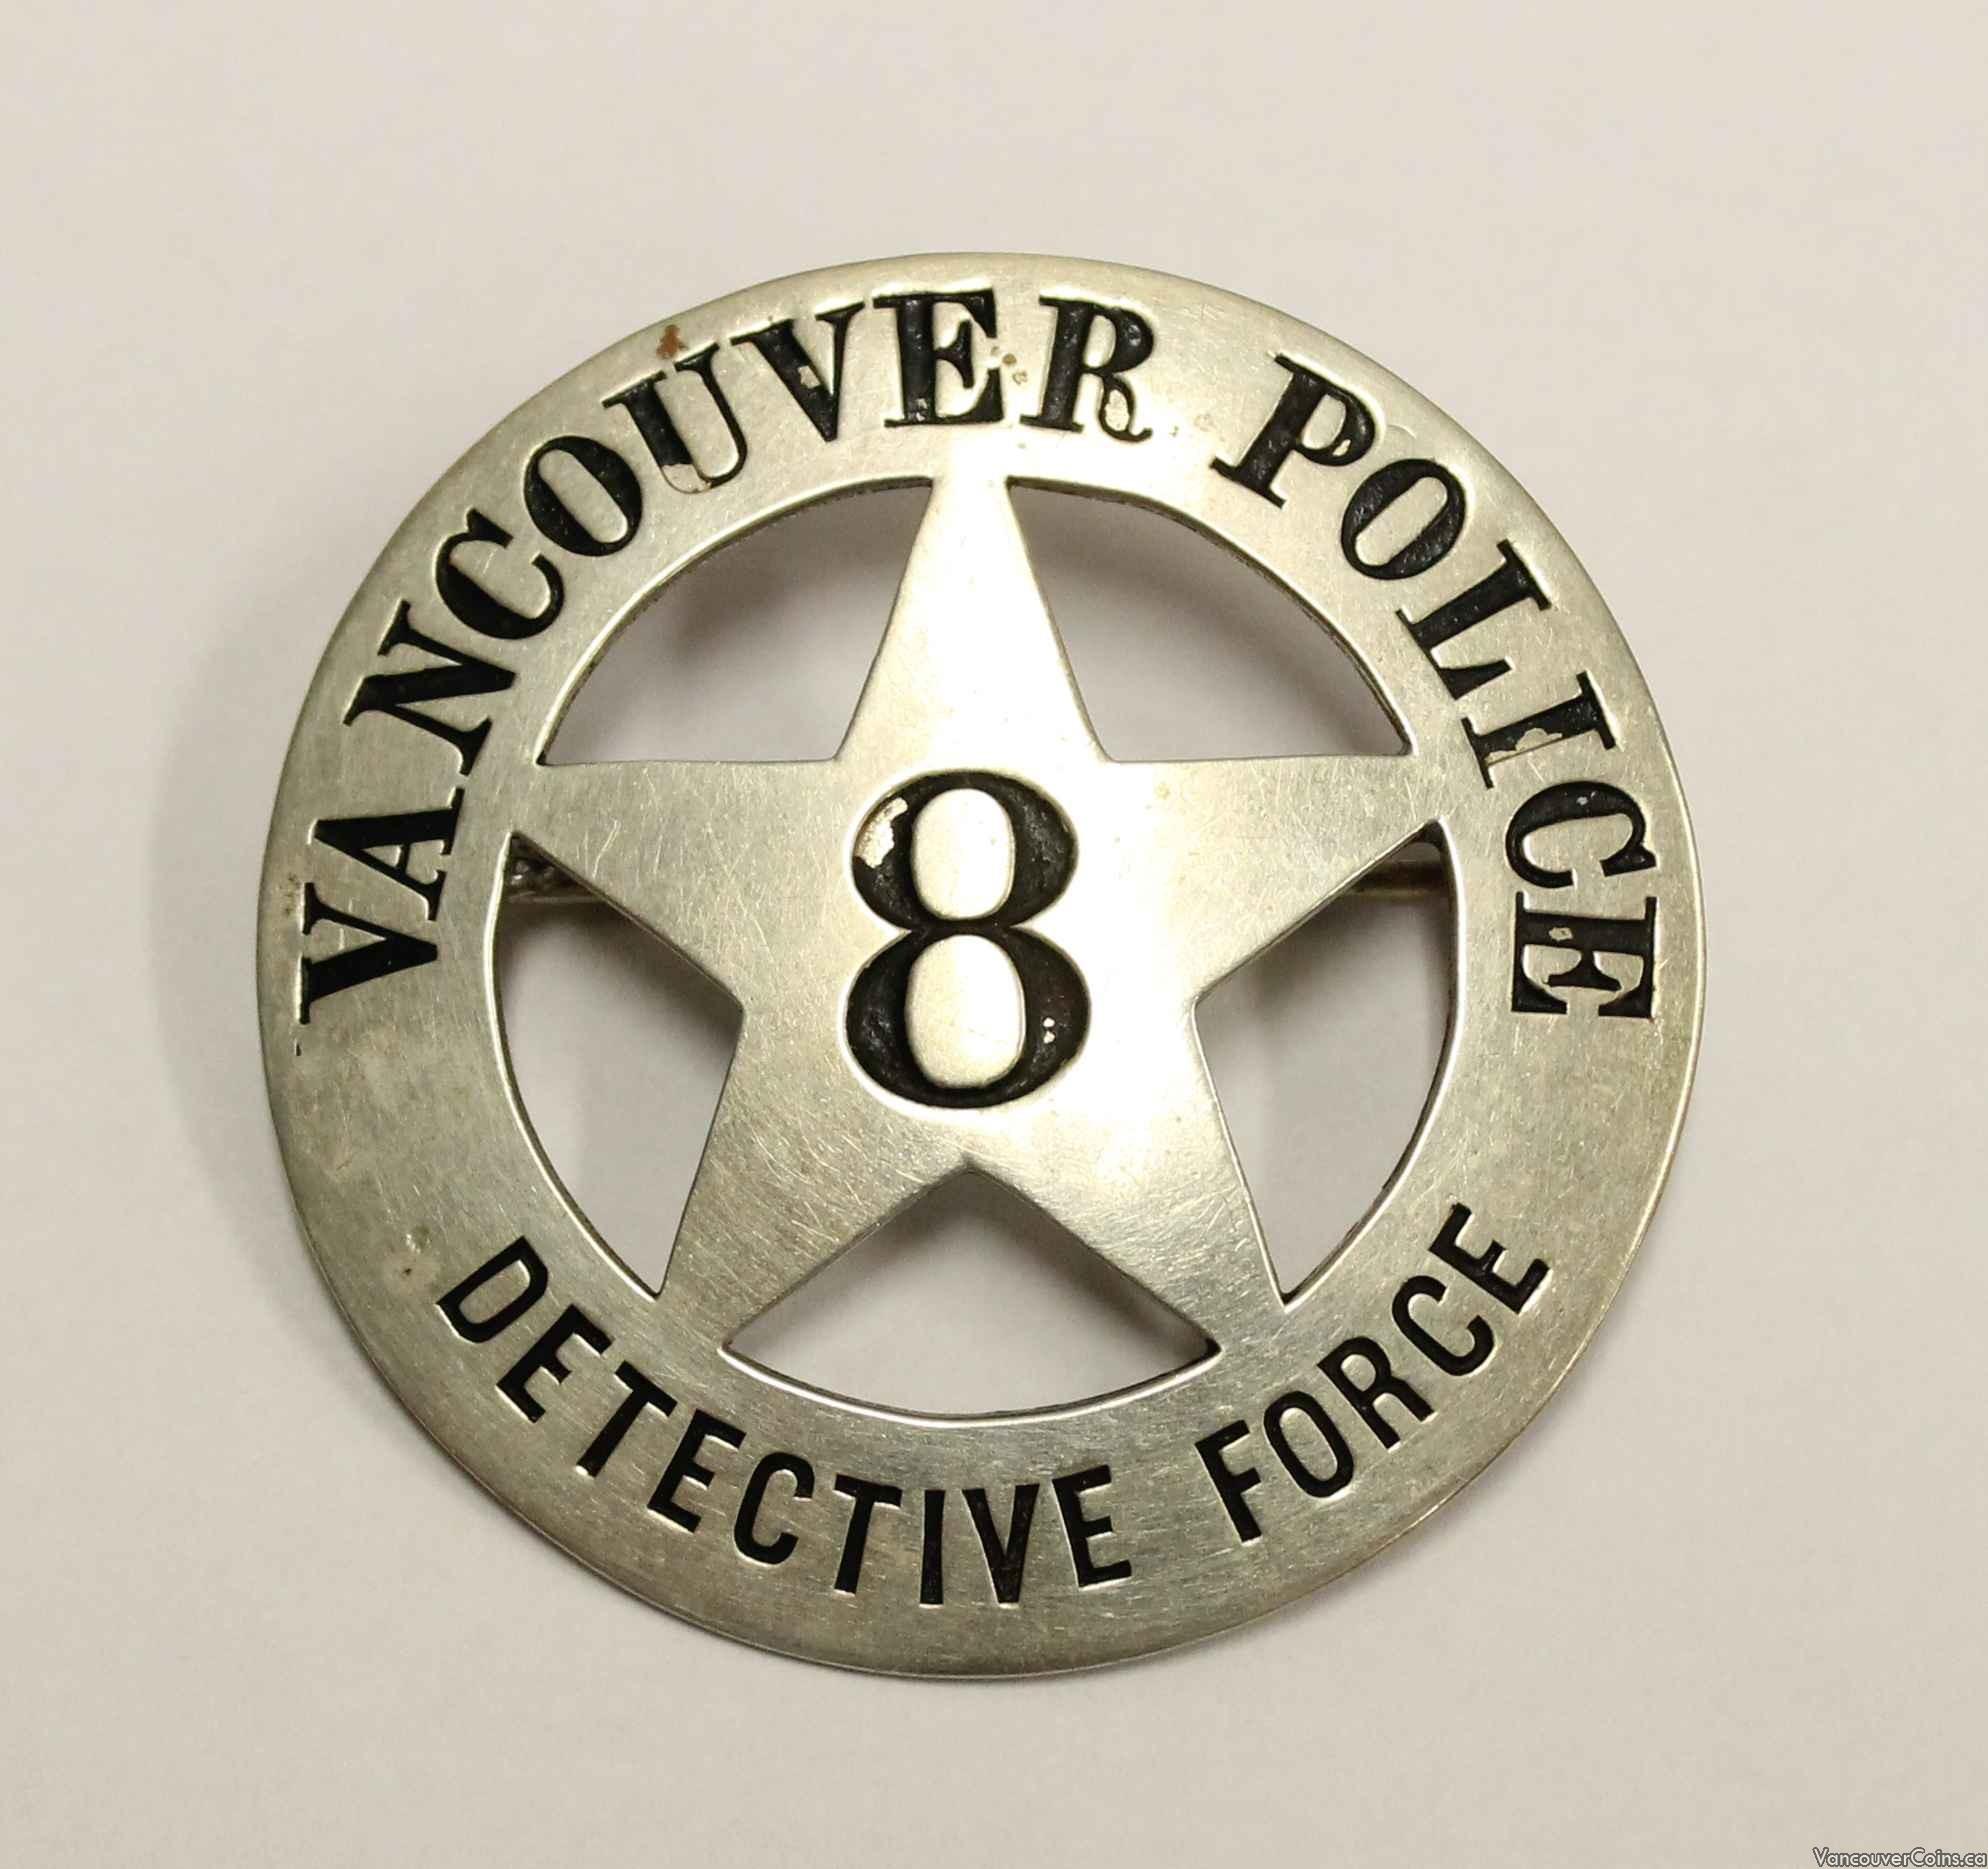 Vintage Vancouver Police Detective Badge Authentic Original Accessories Vpd 3